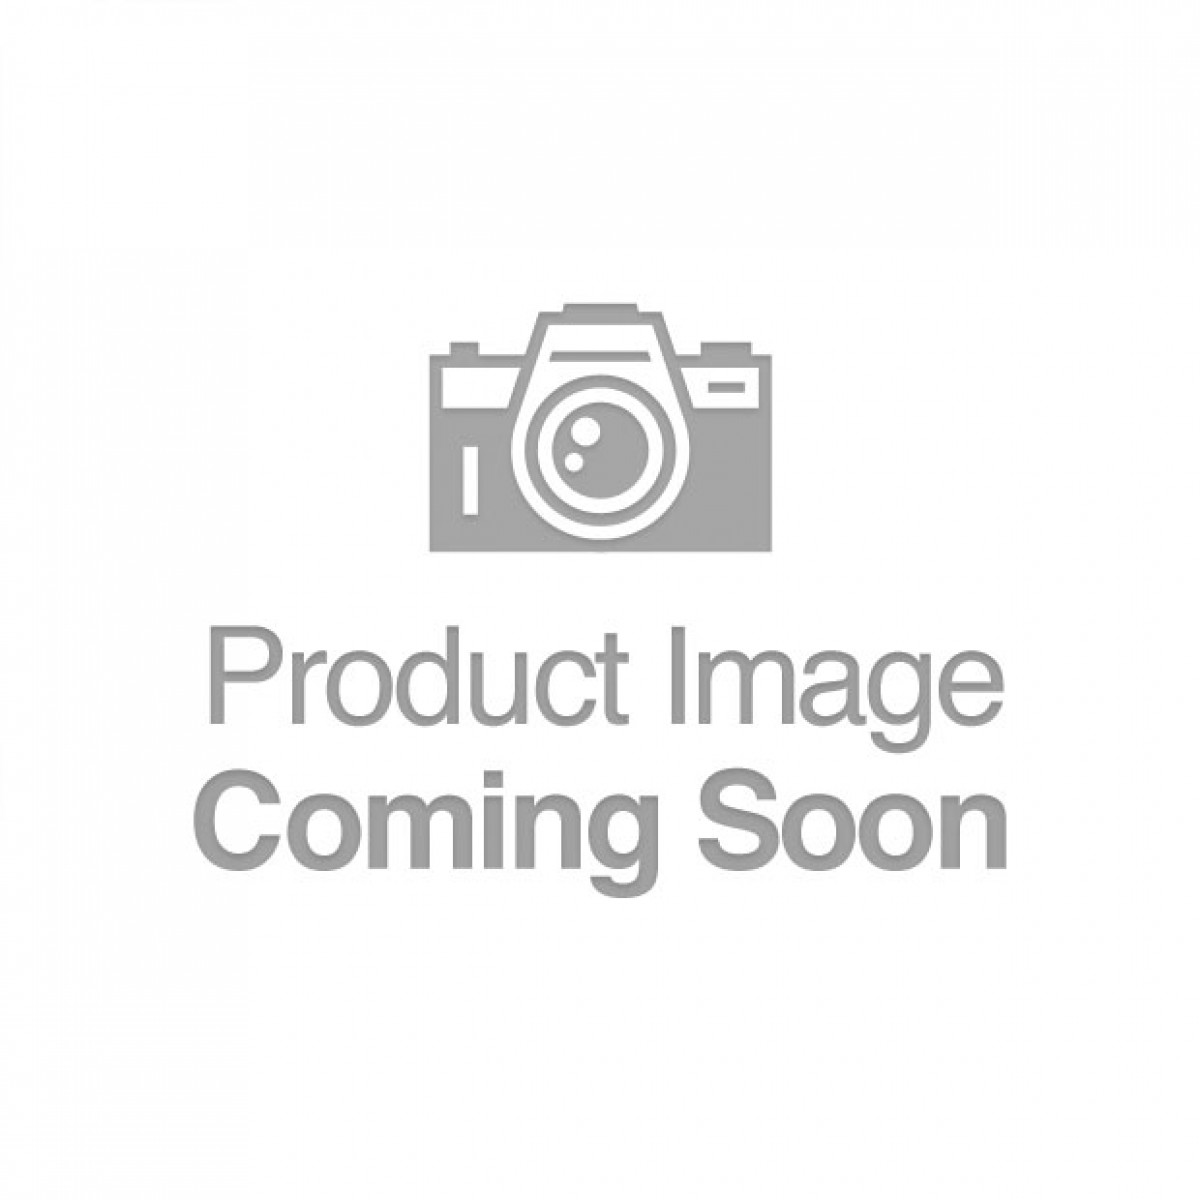 EXSENS Organic Body Oil w/Stones - Tiger Eye Macadamia 100 ml